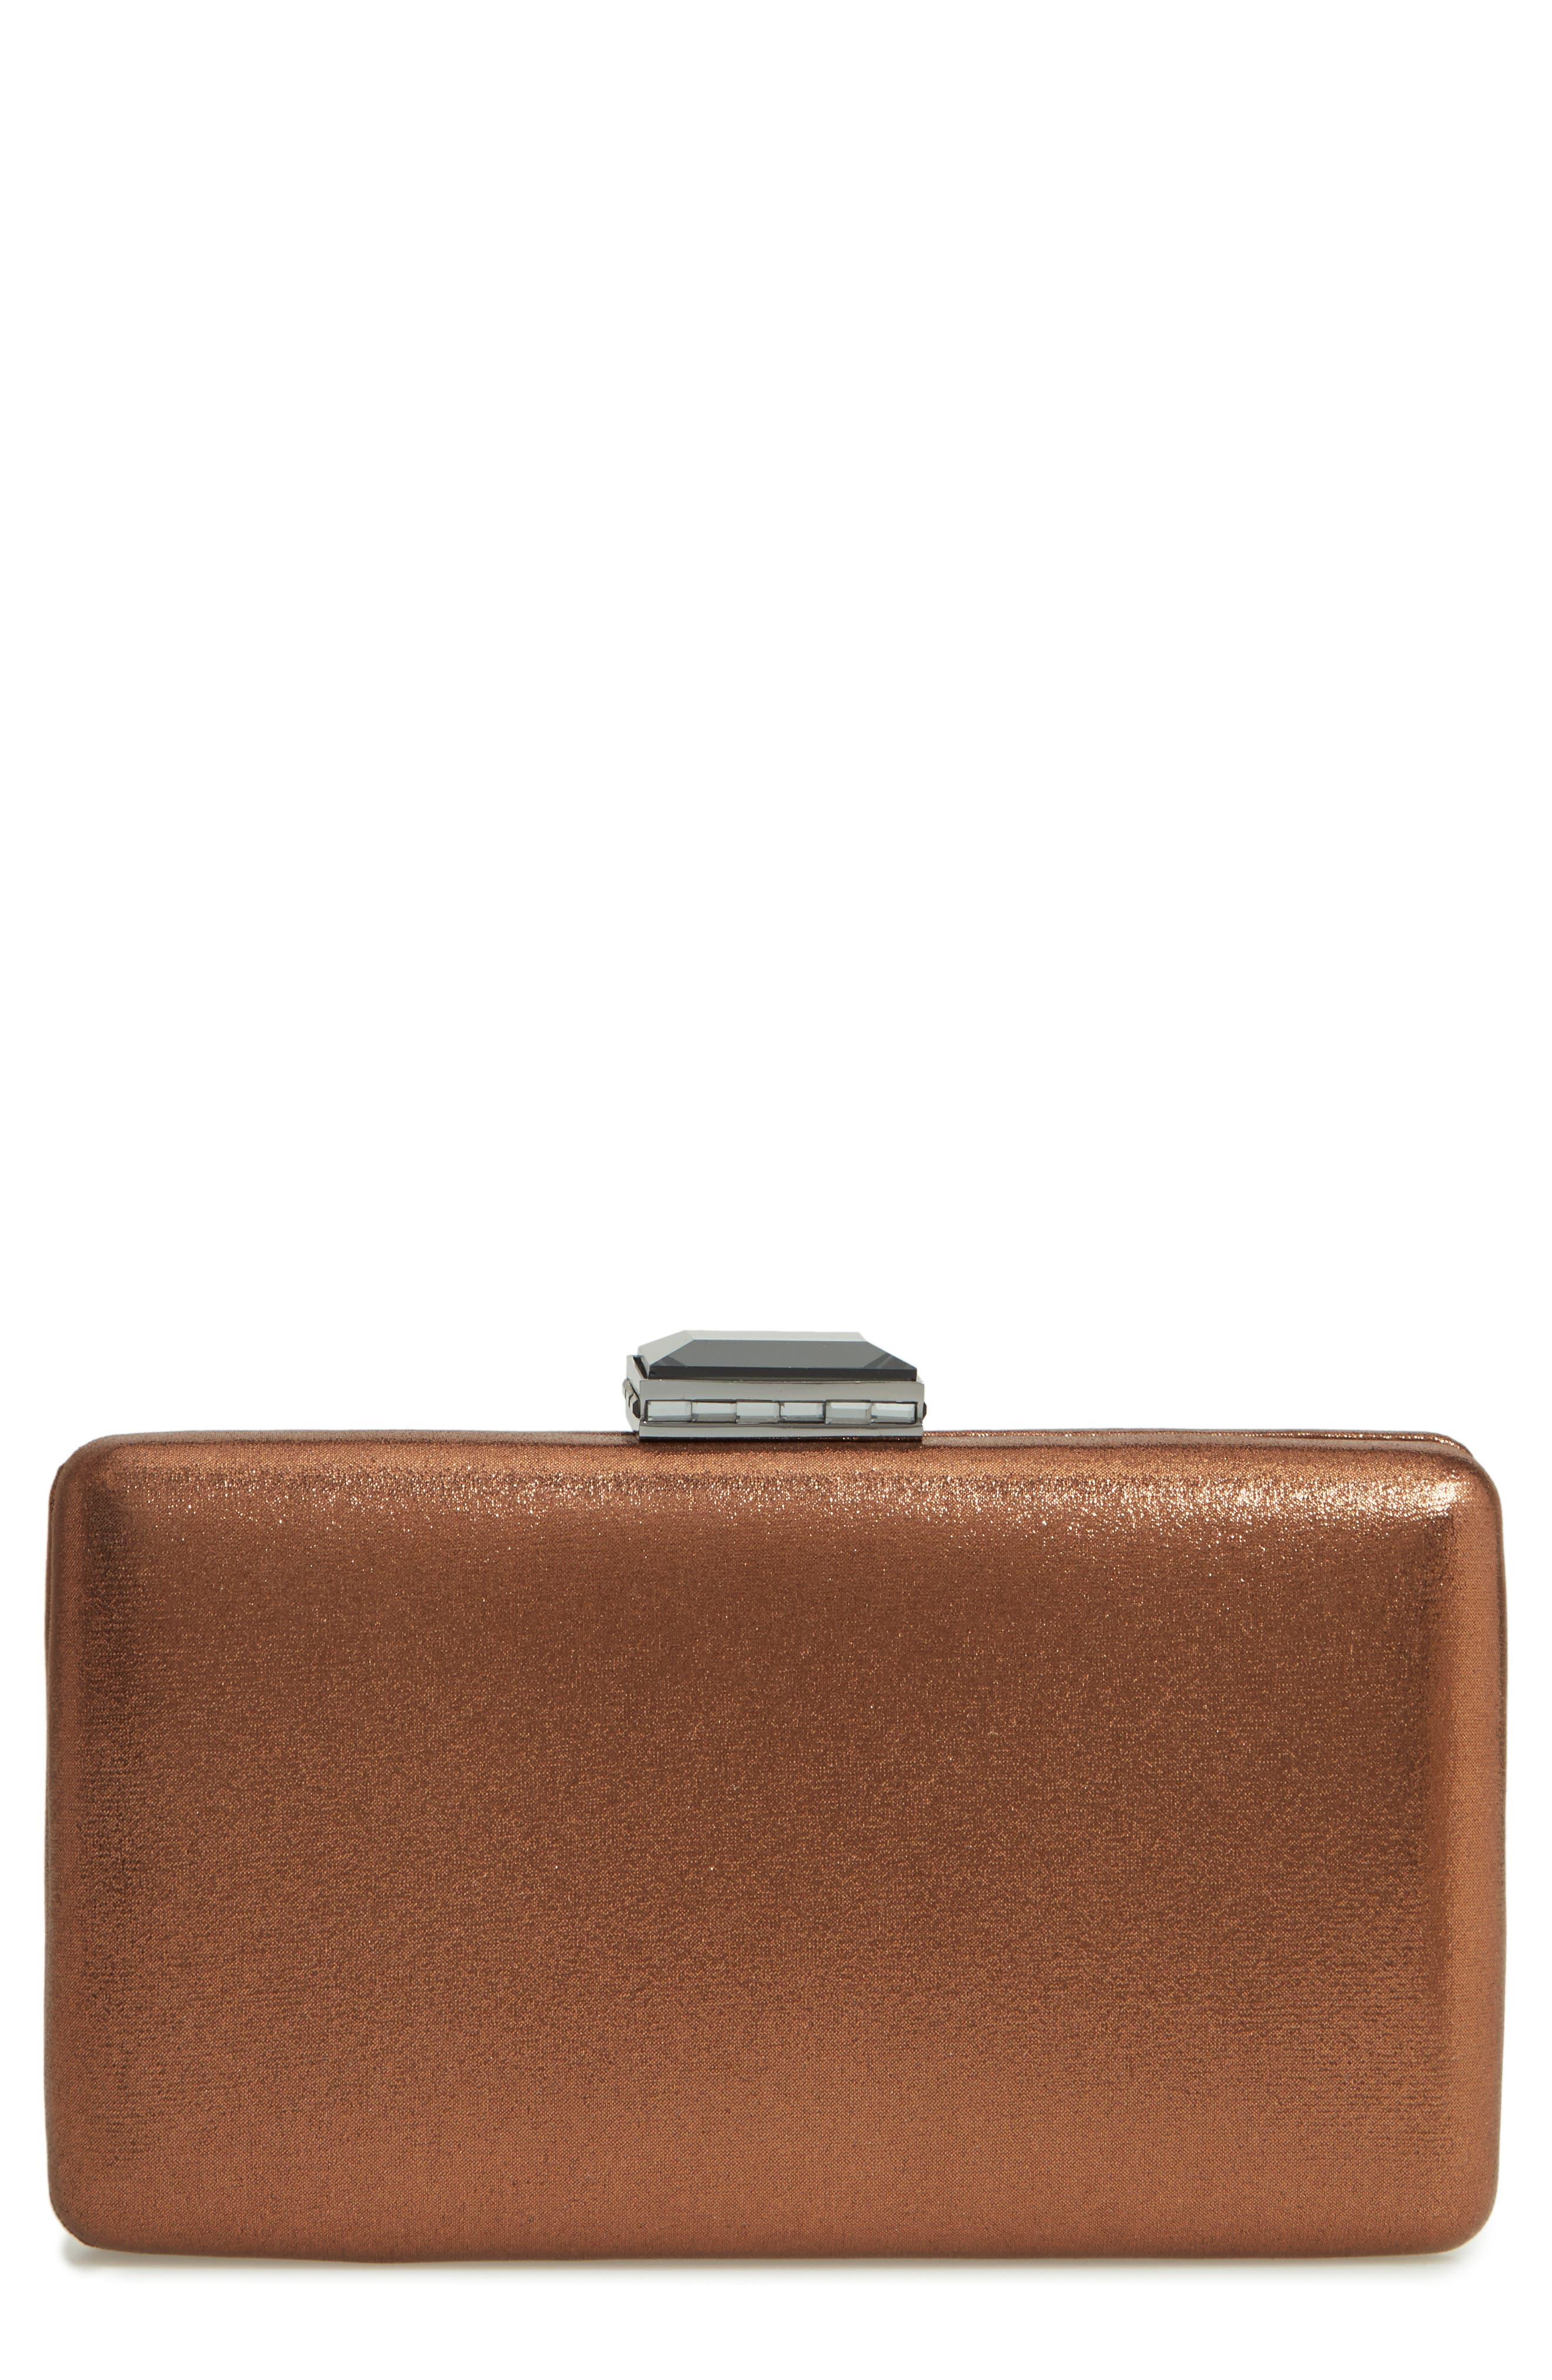 Metallic Box Clutch,                         Main,                         color, BRONZE